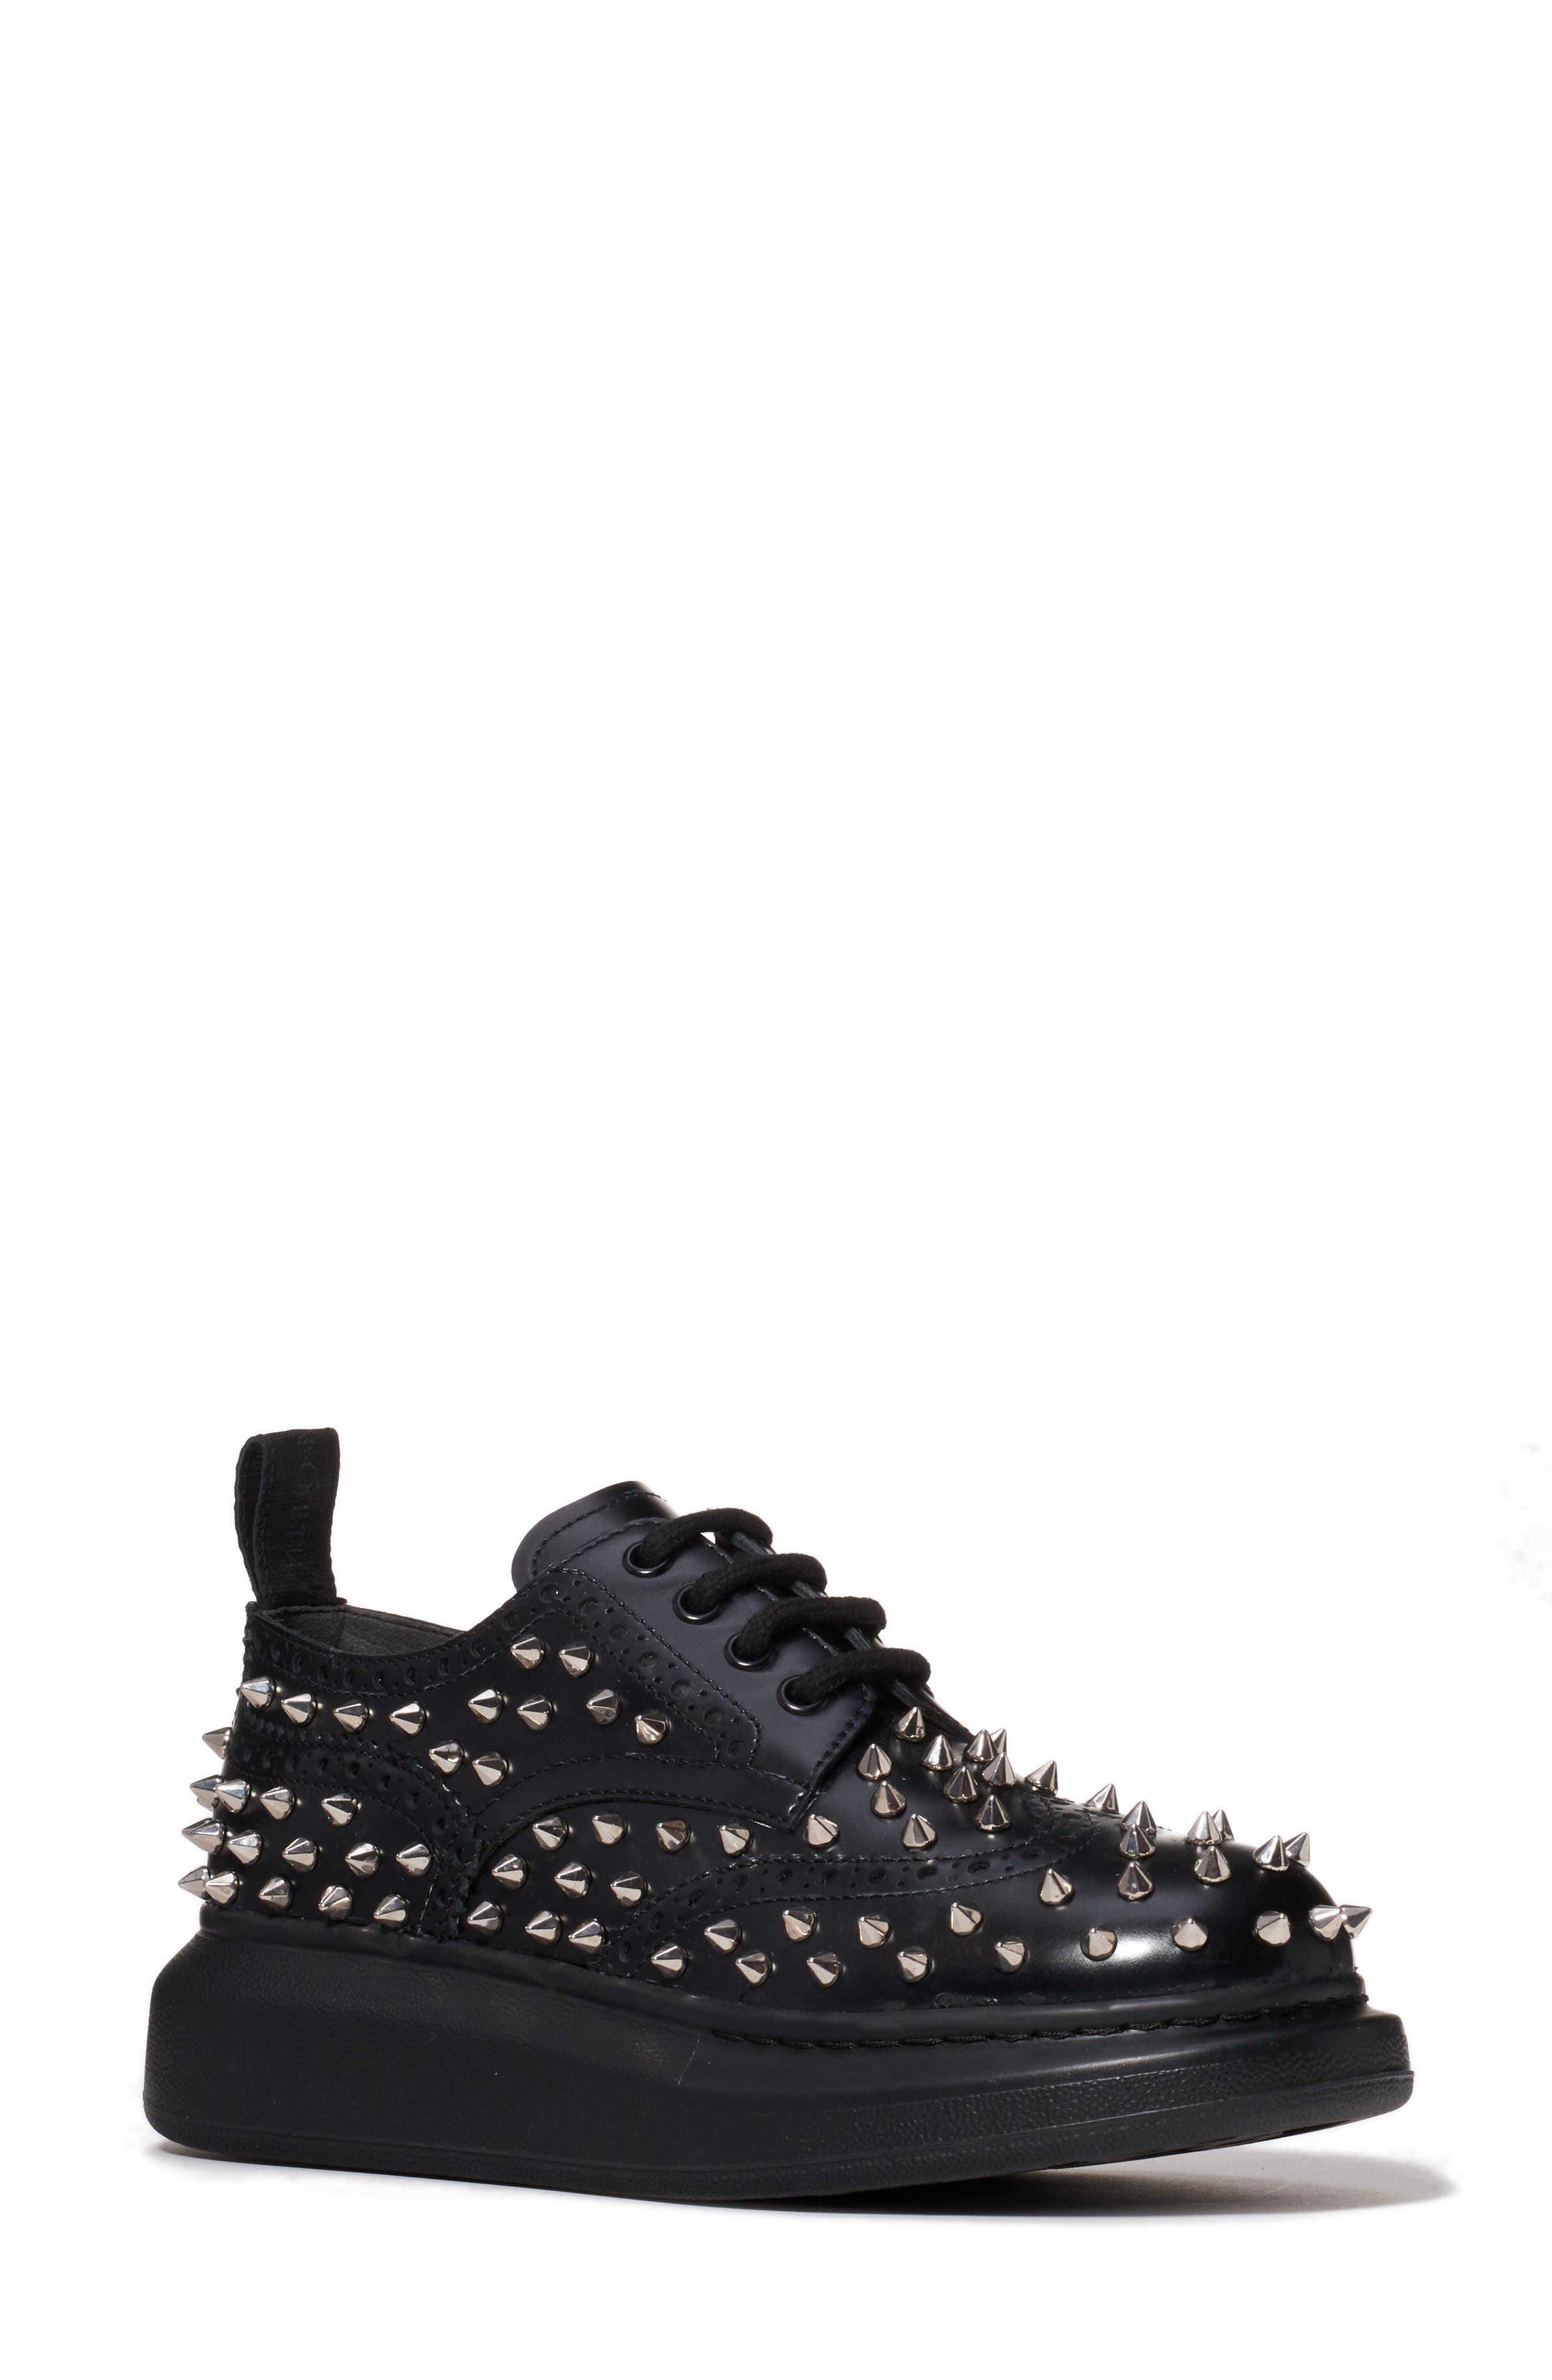 Alexander Mcqueen Studded Platform Sneaker, Black